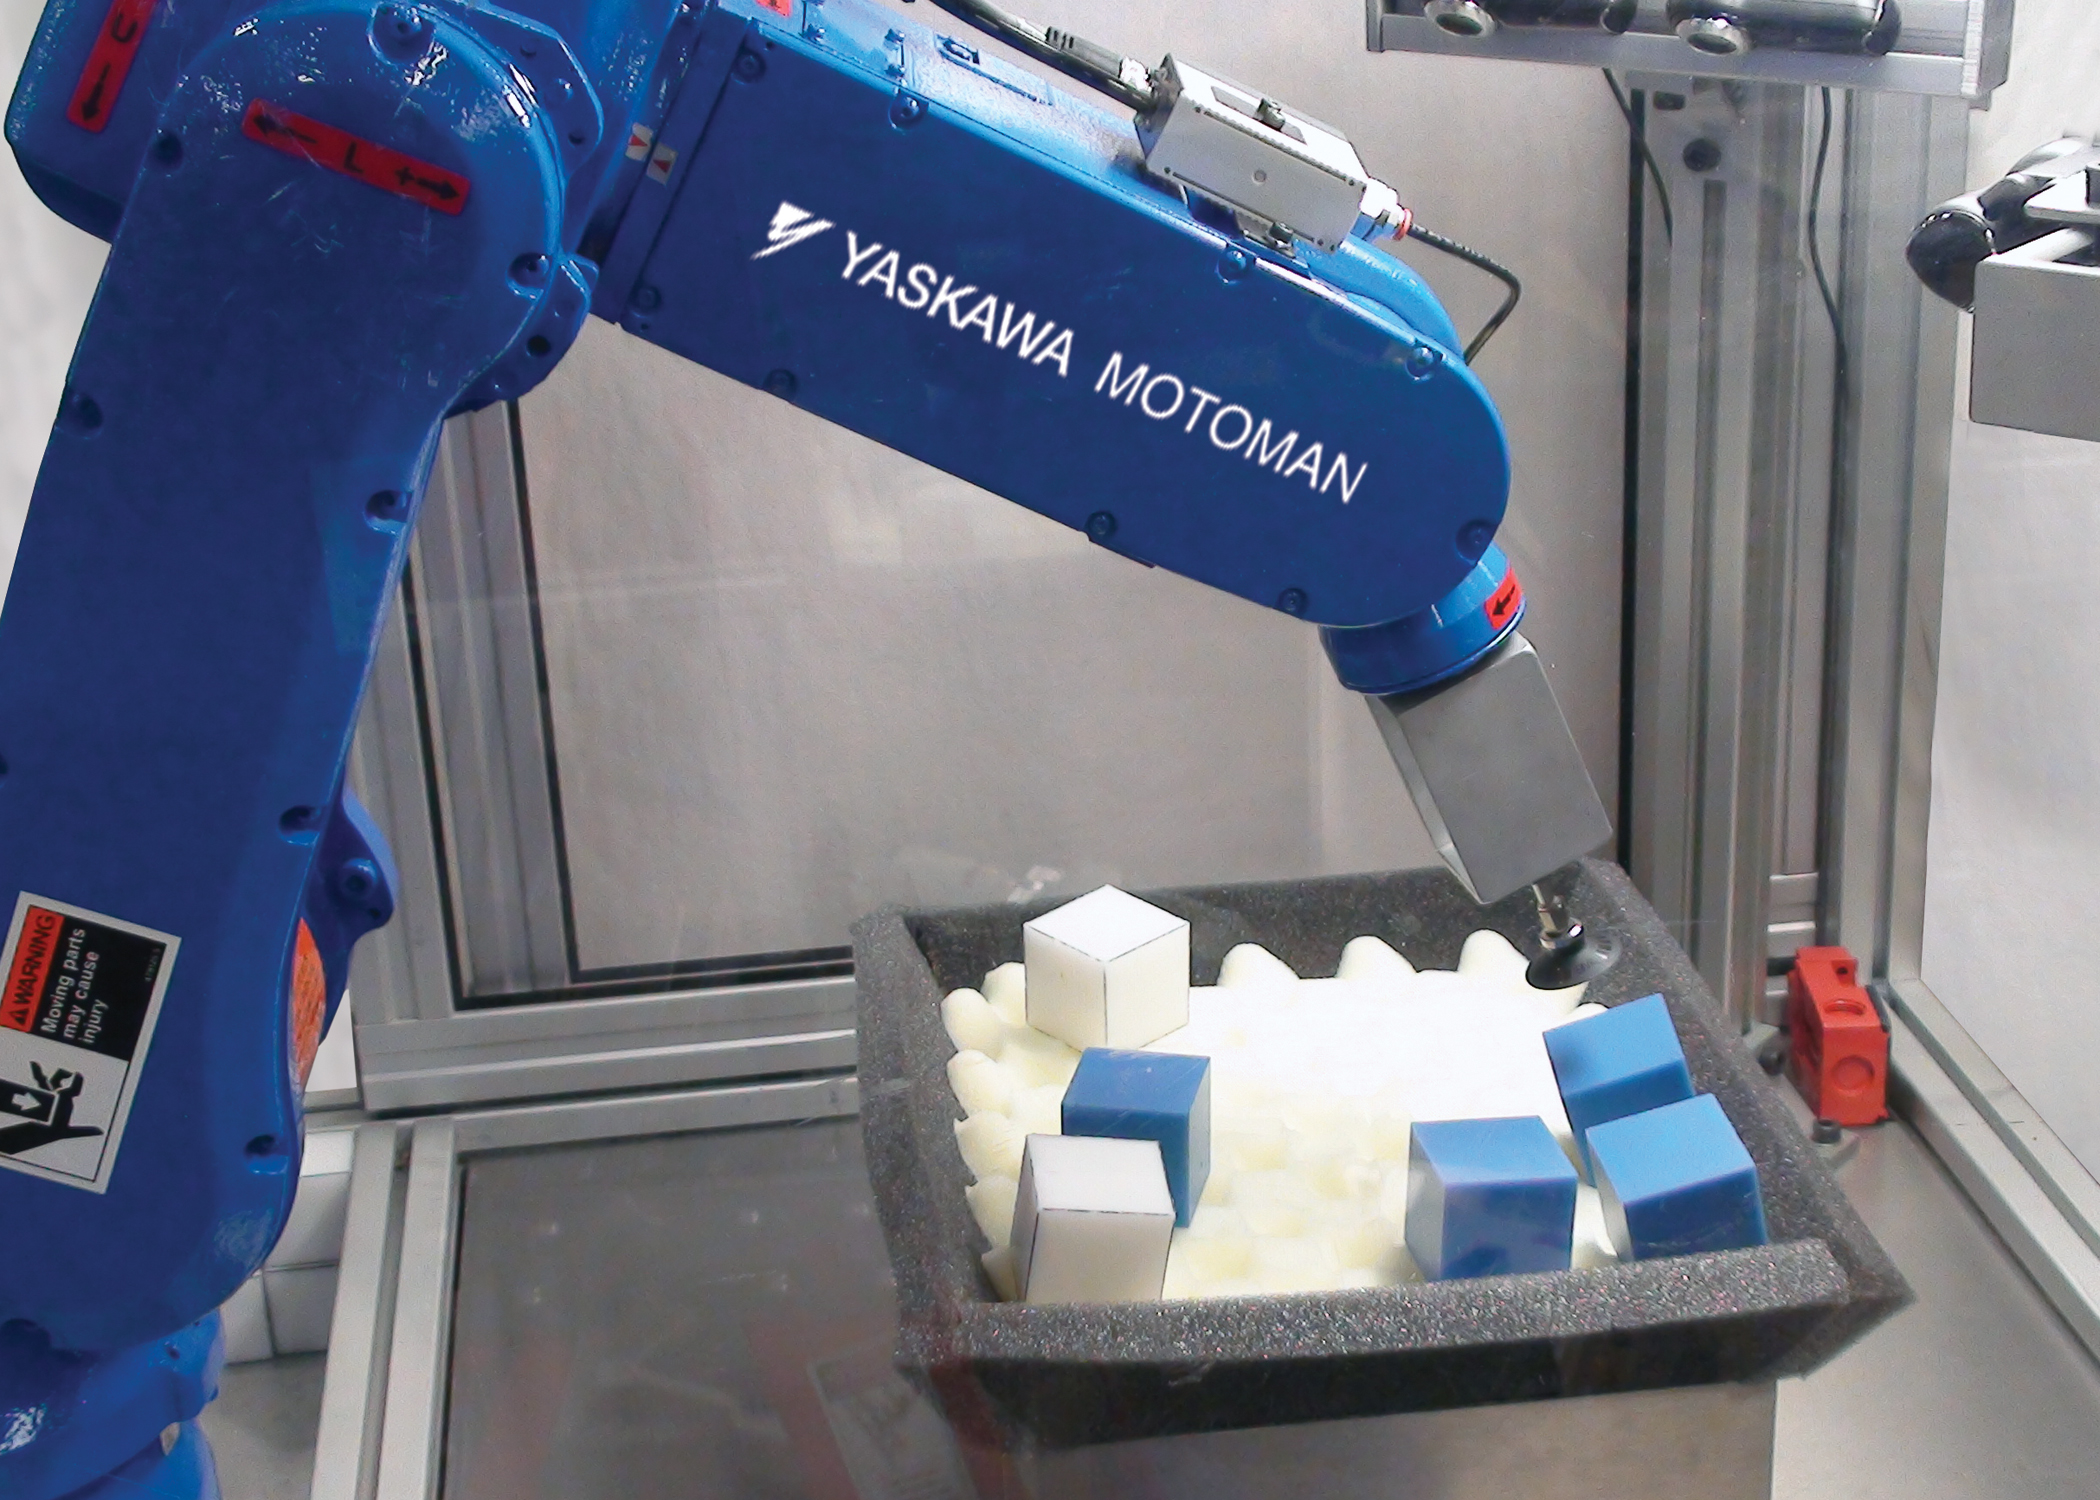 Motoman Robotics And Universal Robotics Unveil New 3d Vision